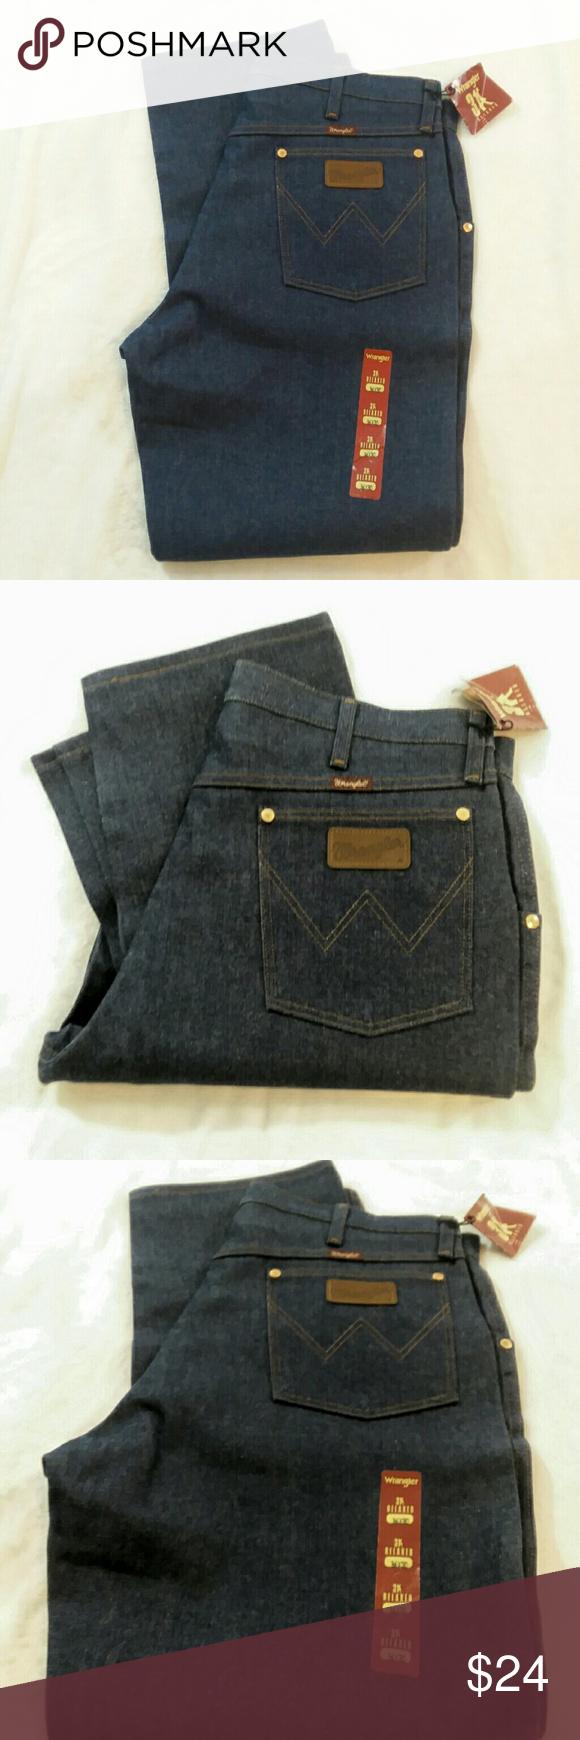 ea6a7910 Wrangler Jeans: Men's Rigid Indigo 31MWZ DN Cow When both comfort and  toughness are on